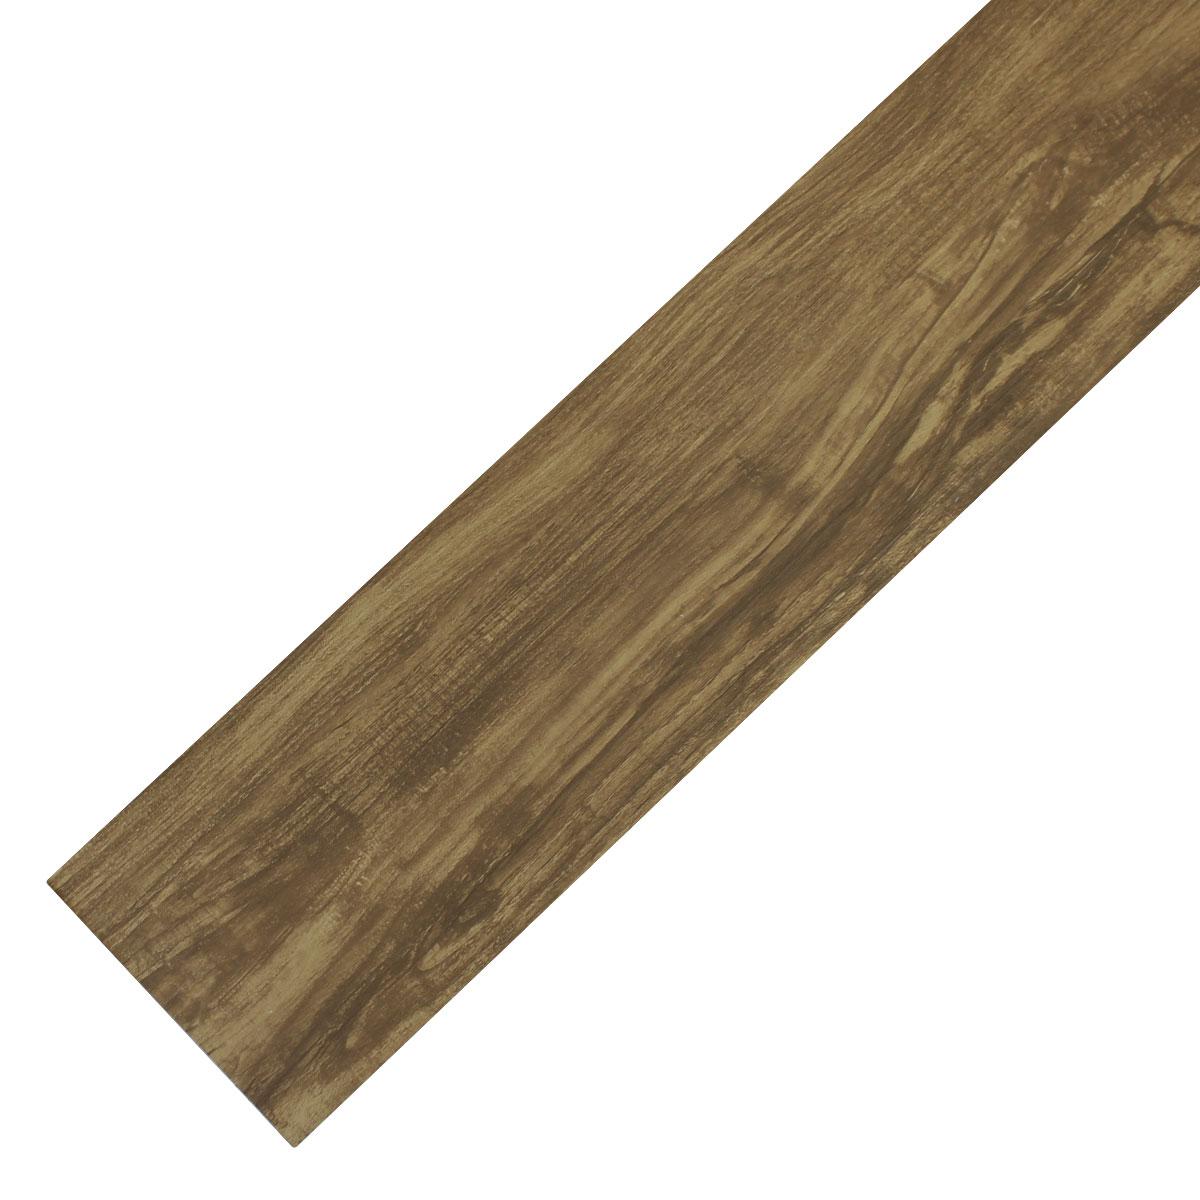 1m vinyl laminate self adhesive textured matte flooring planks floor. Black Bedroom Furniture Sets. Home Design Ideas